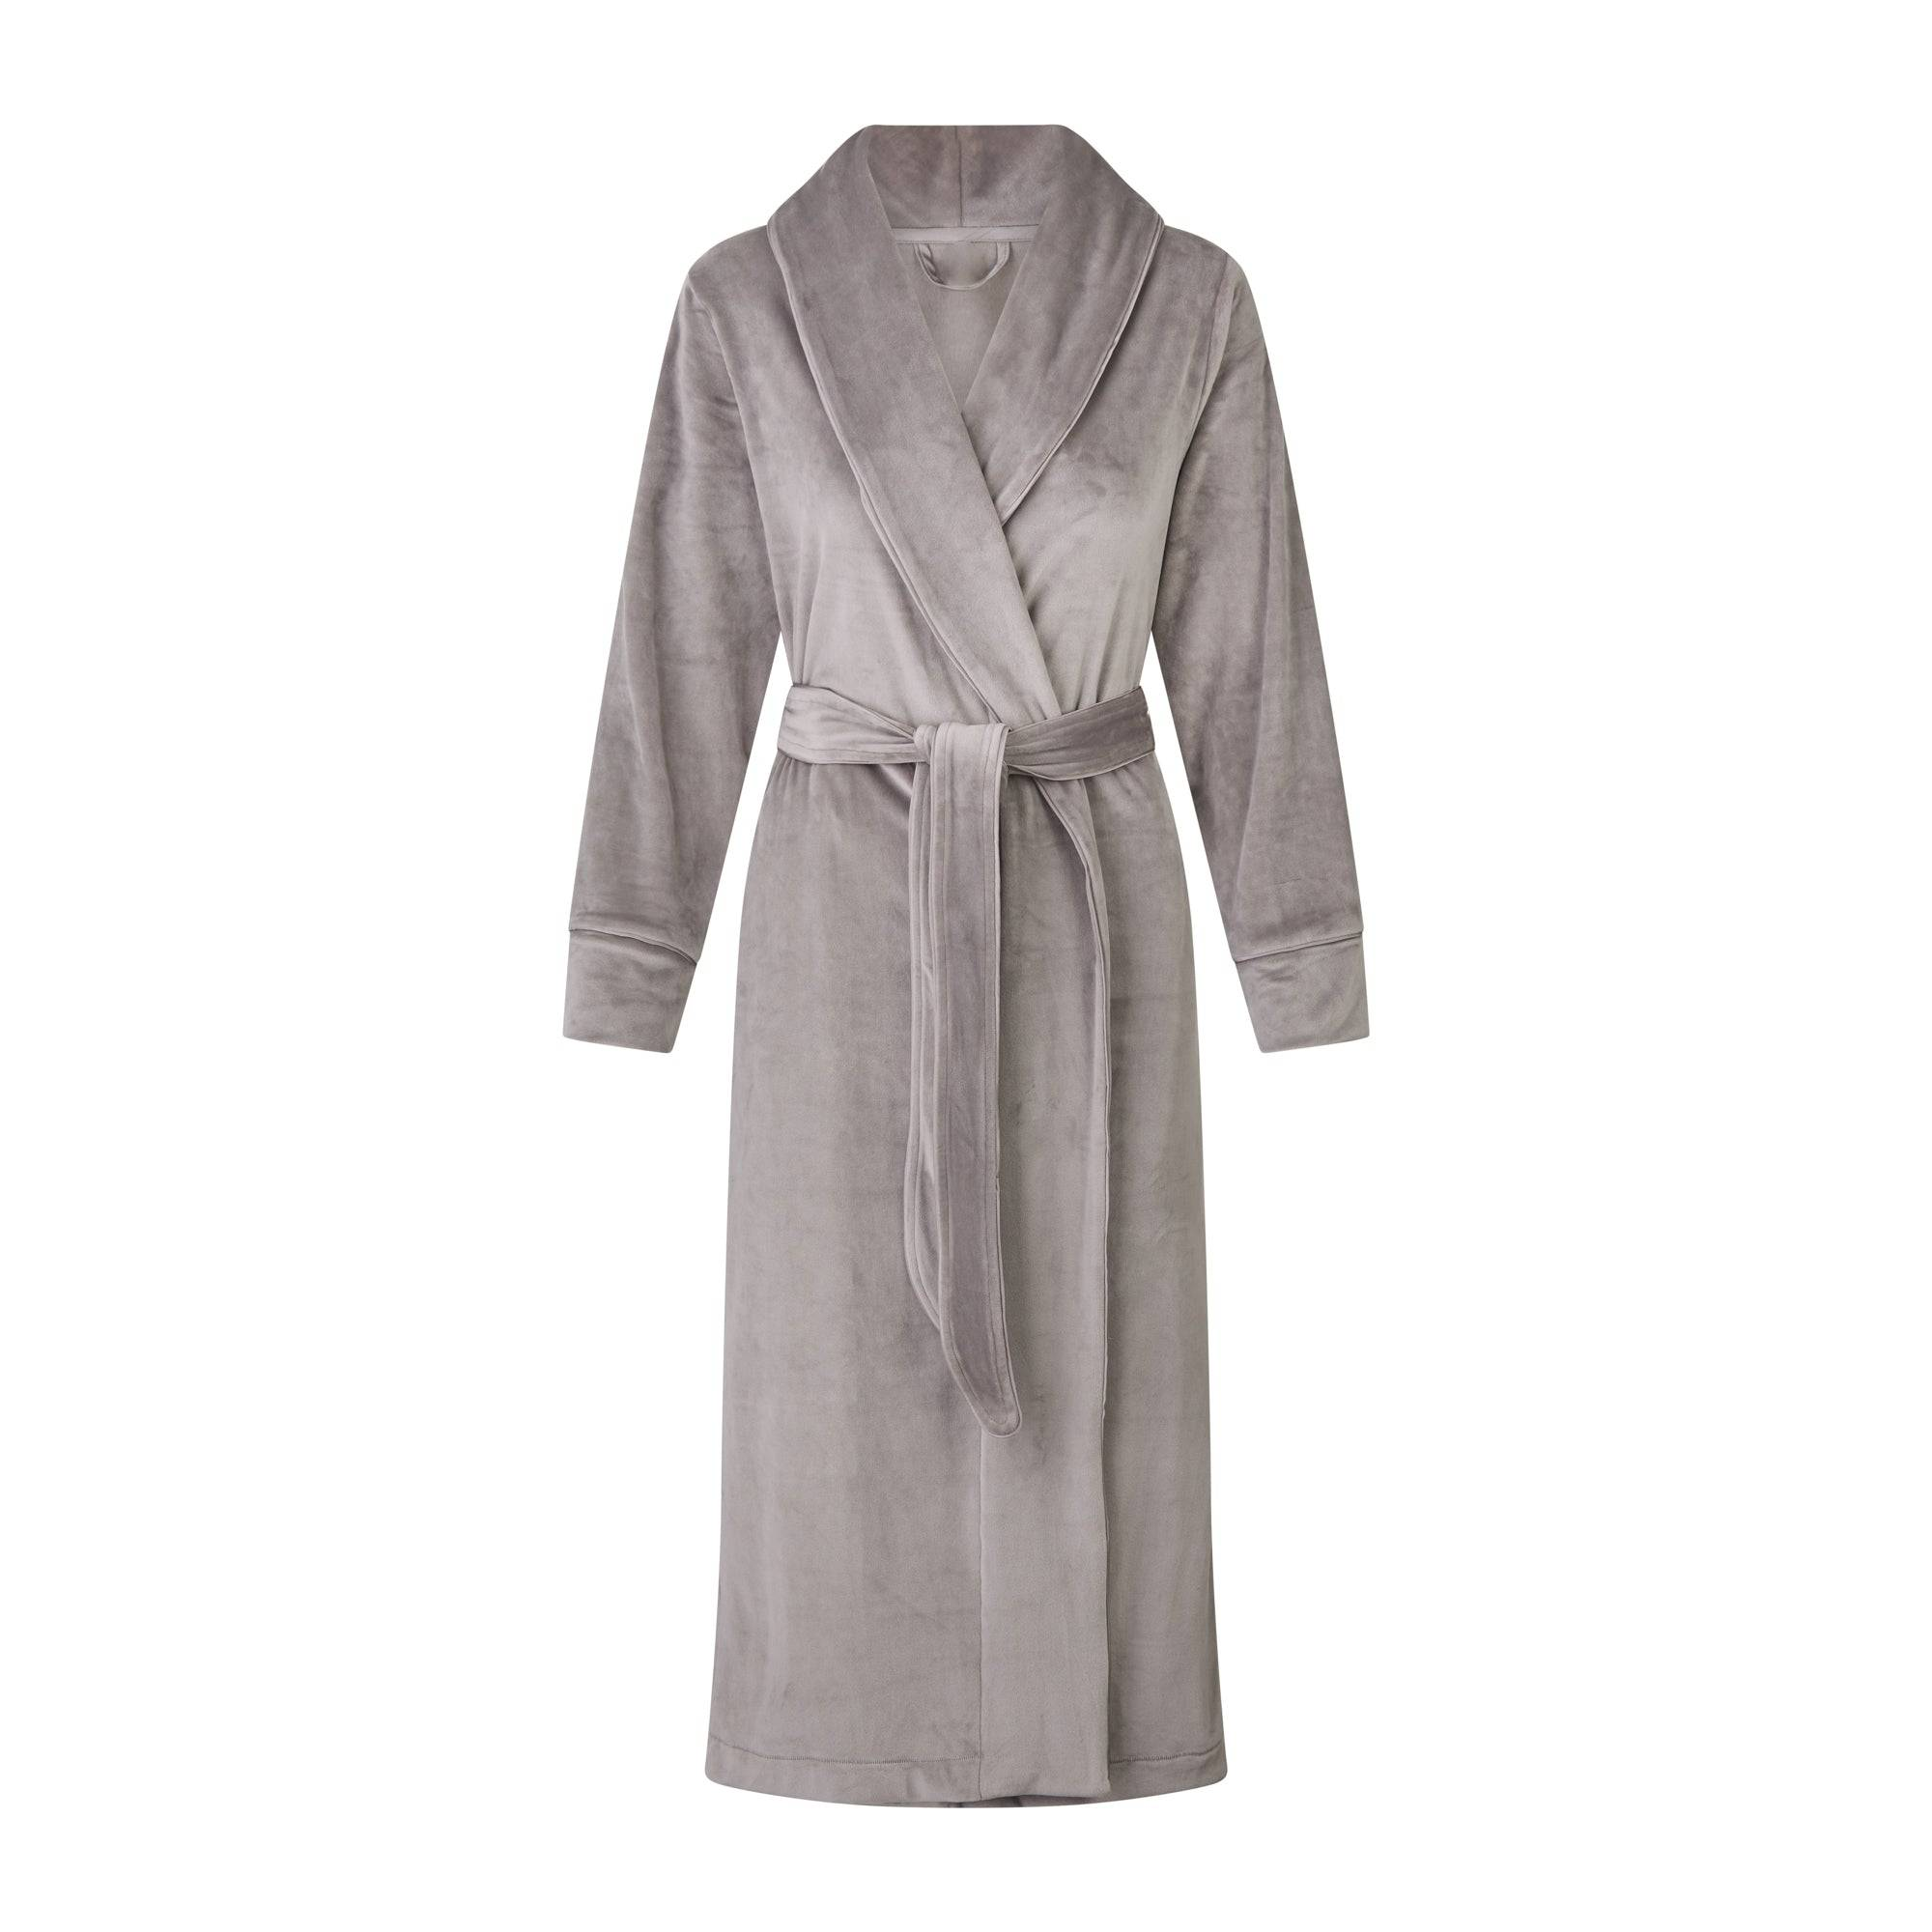 SKIMS Women's Velour Long Robe - Gray - Size L; Gray